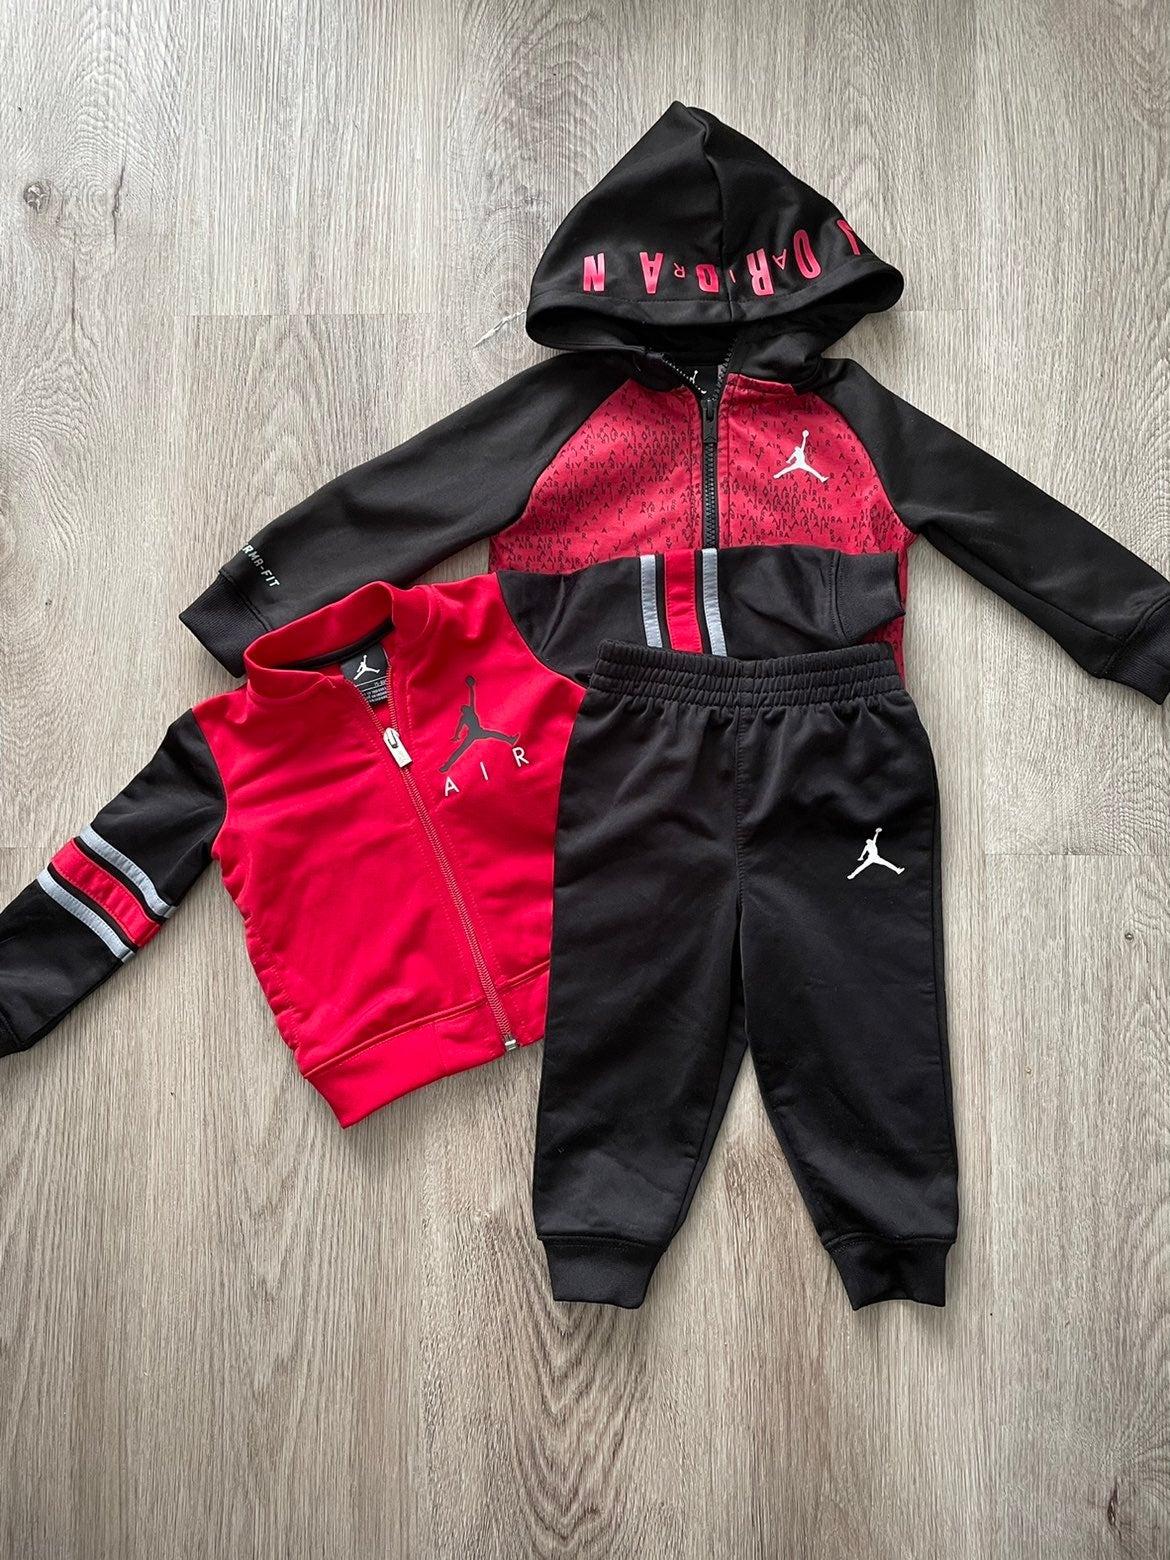 Boys 3 Piece Air Jordan Pants Set Sz 12M